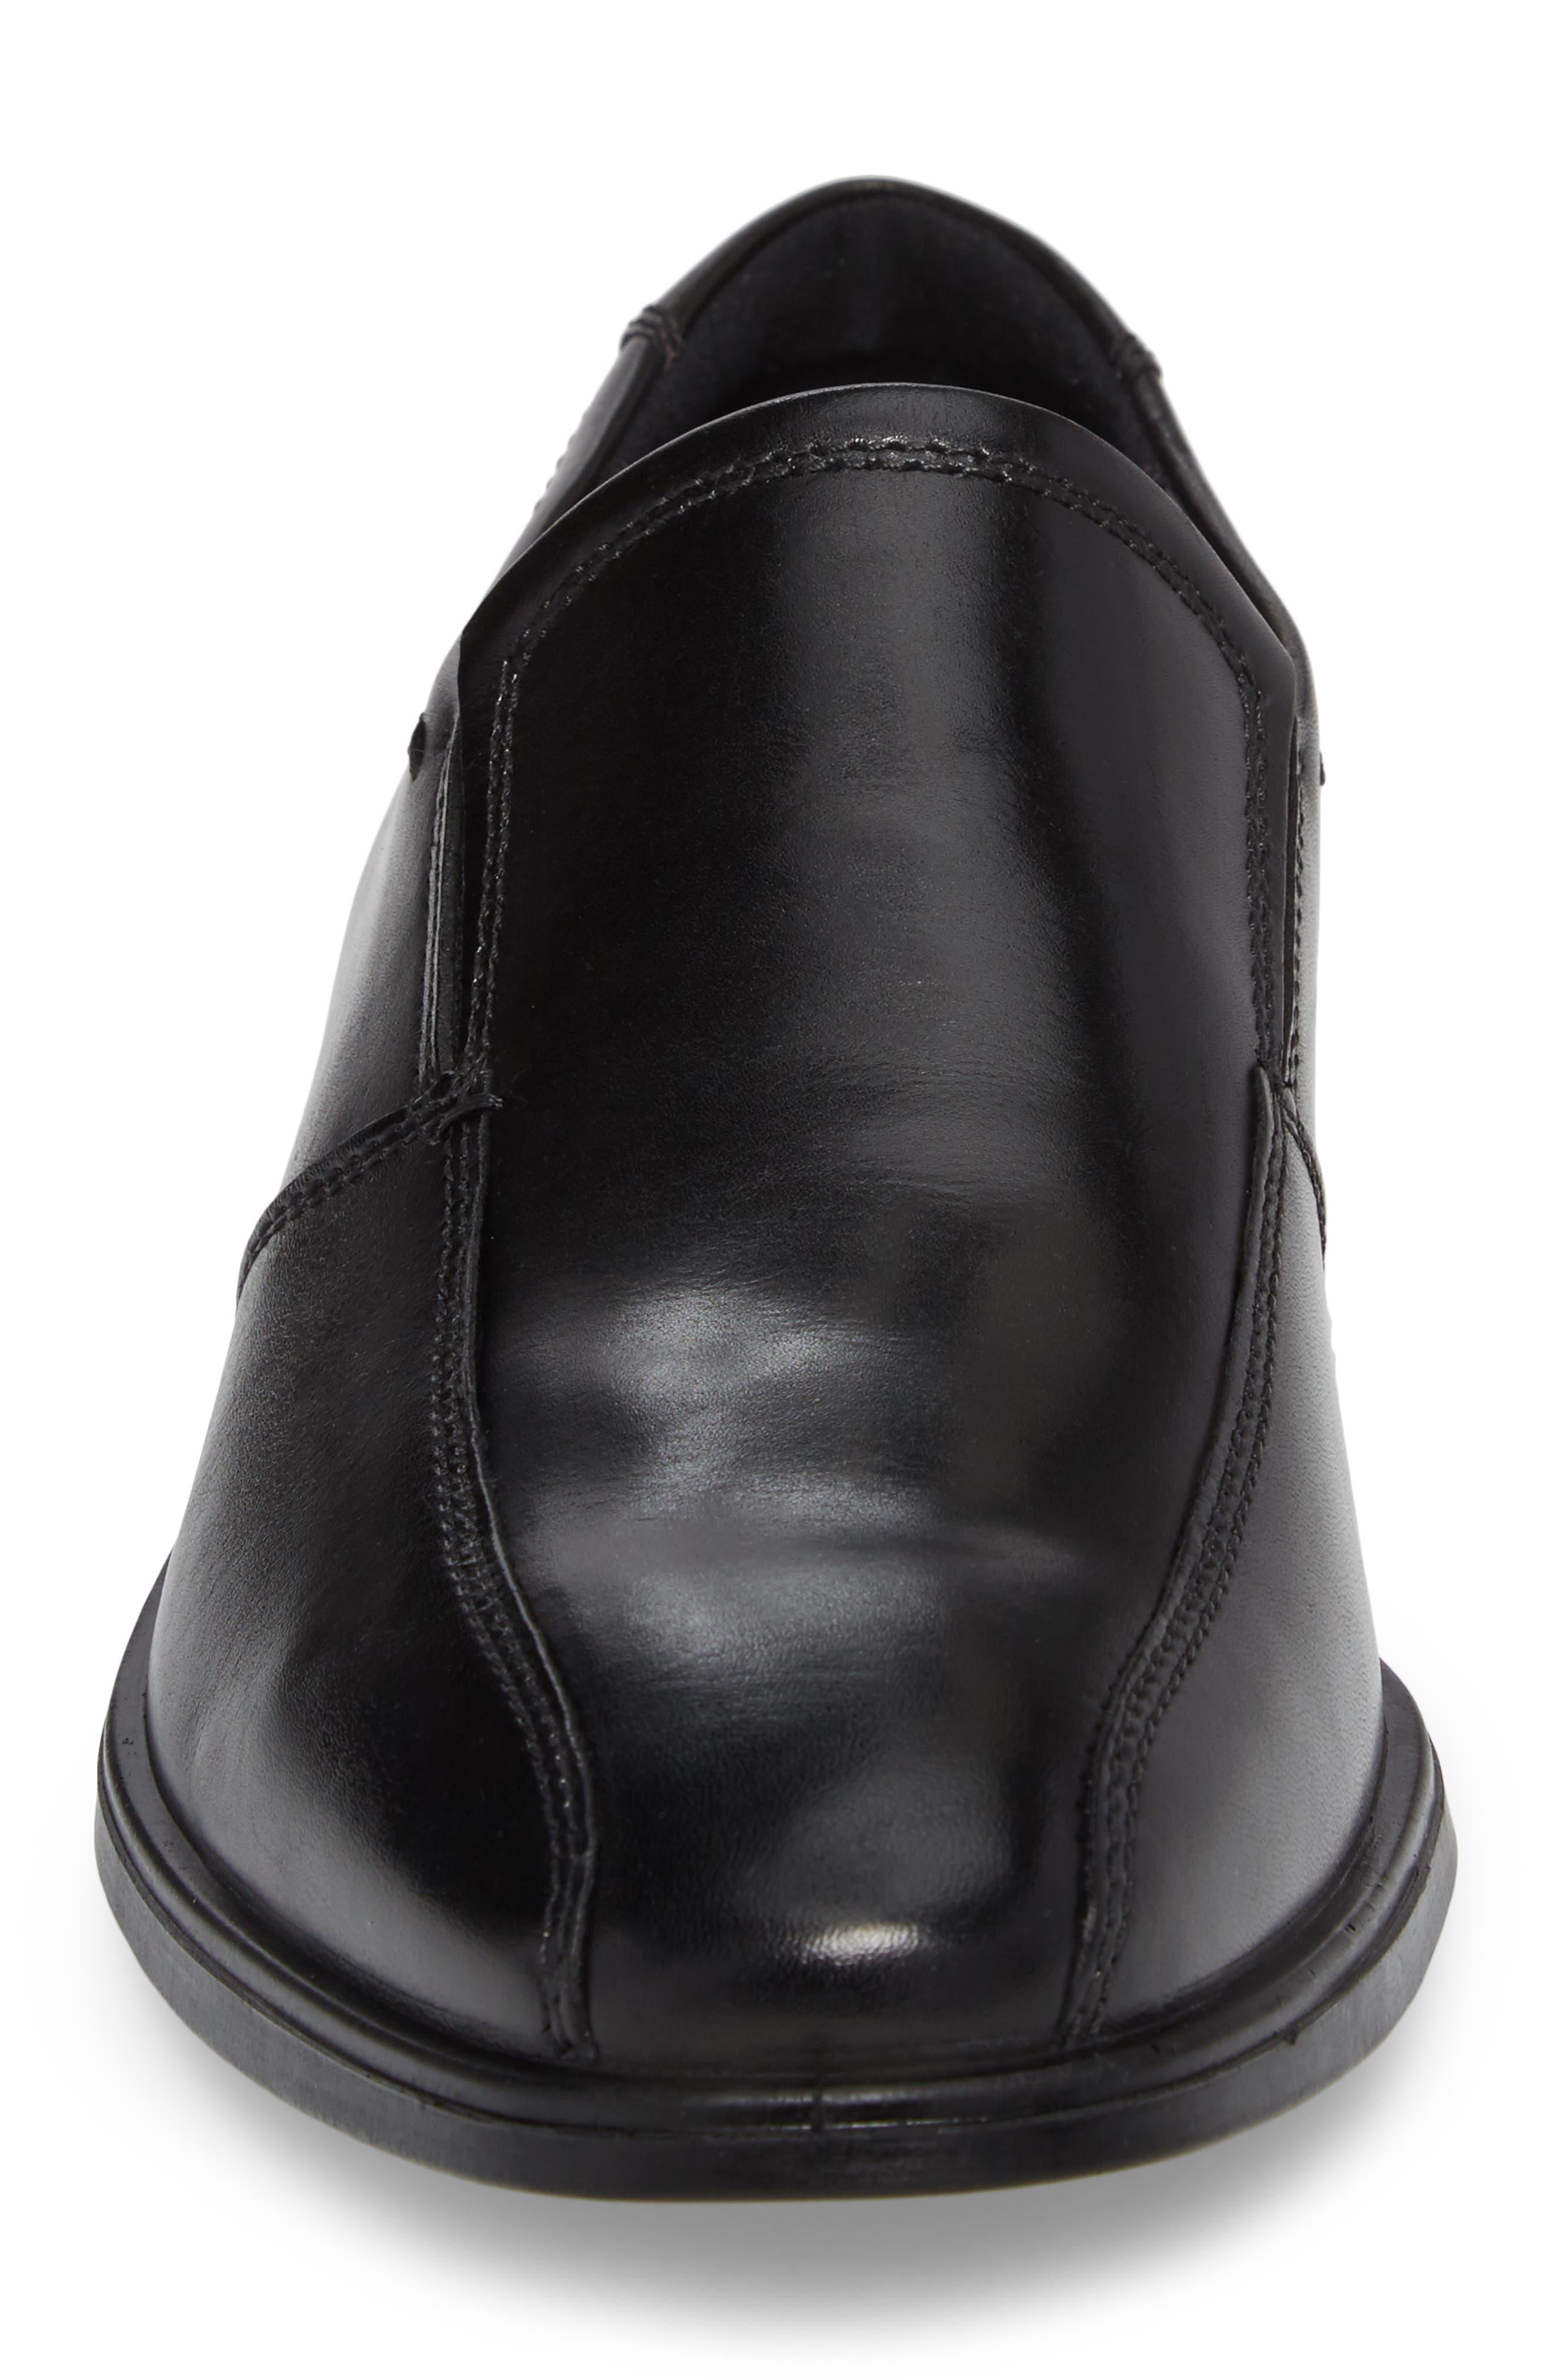 Melbourne Venetian Loafer,                             Alternate thumbnail 4, color,                             BLACK LEATHER